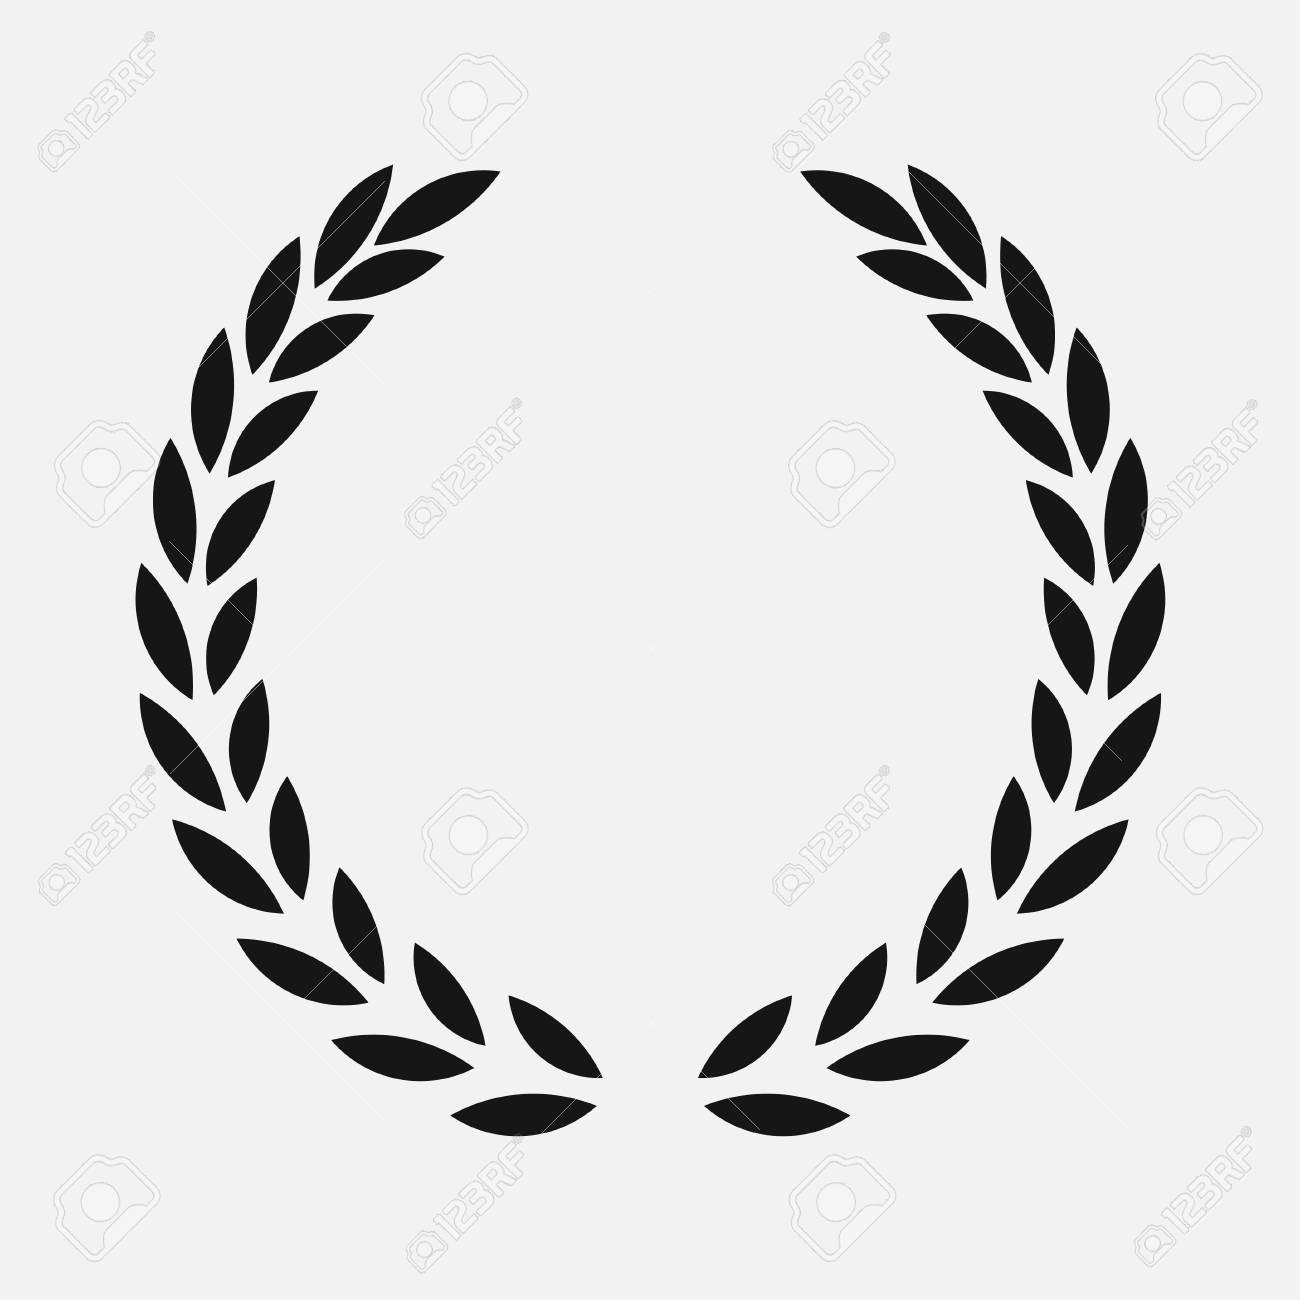 icon laurel wreath.